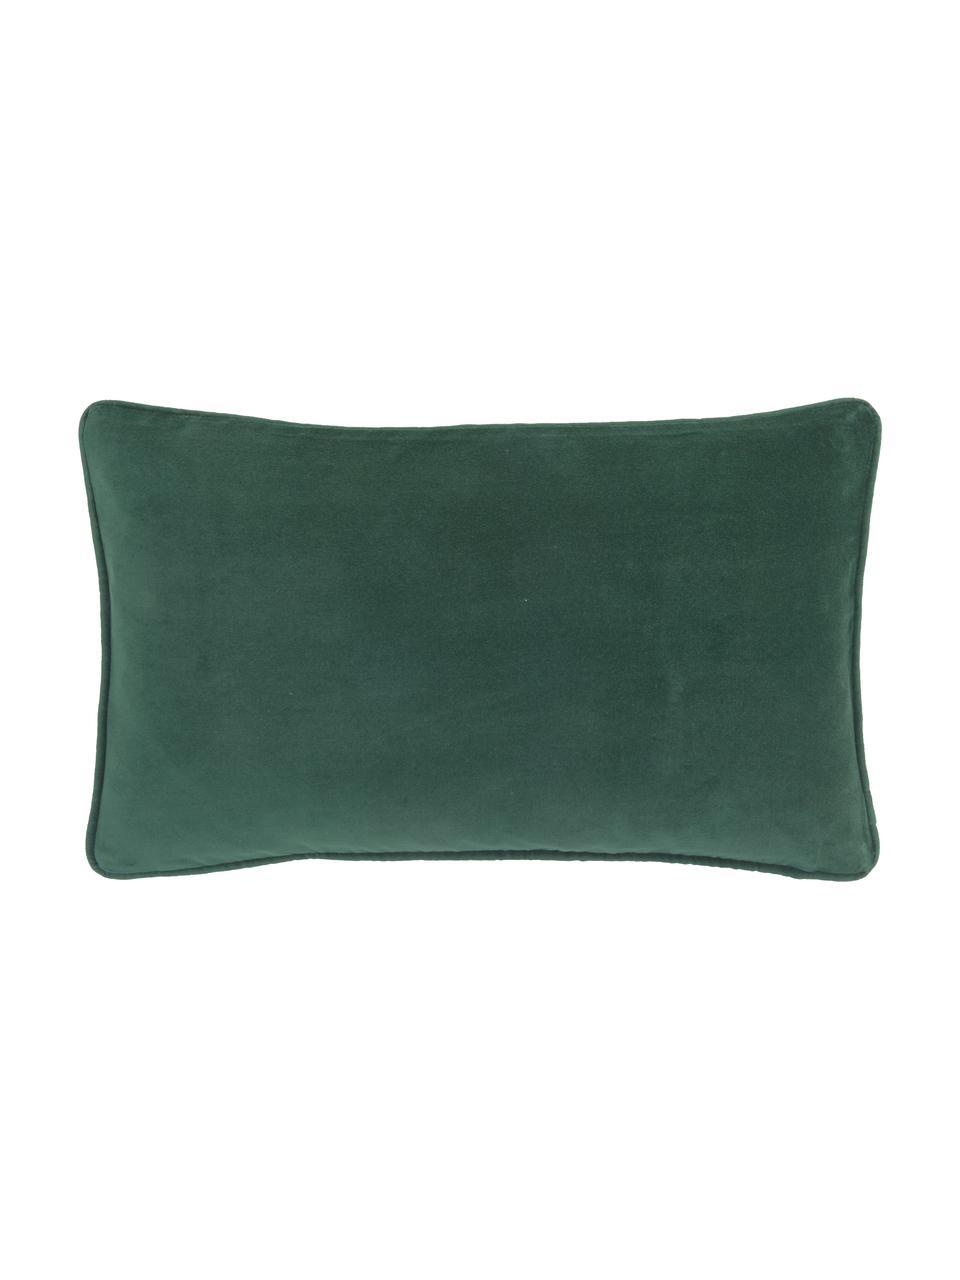 Effen fluwelen kussenhoes Dana in smaragdgroen, 100% katoenfluweel, Smaragdgroen, 30 x 50 cm